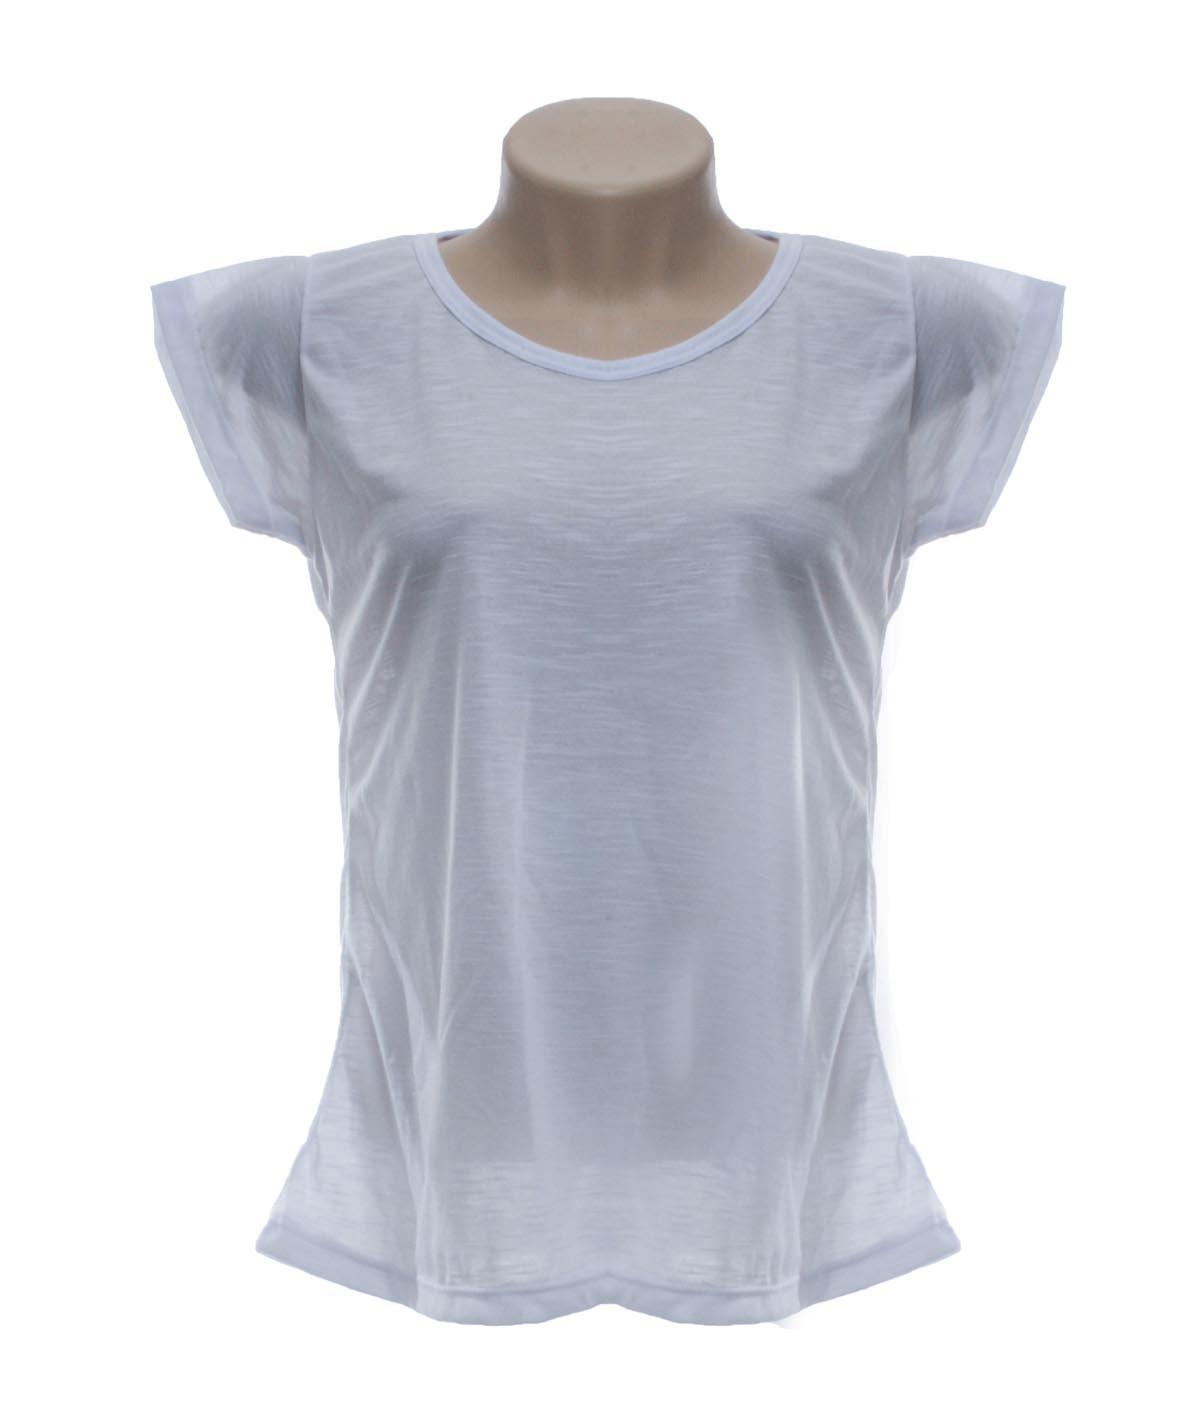 d47adbb5be Camiseta Batinha - Pra Sublimar